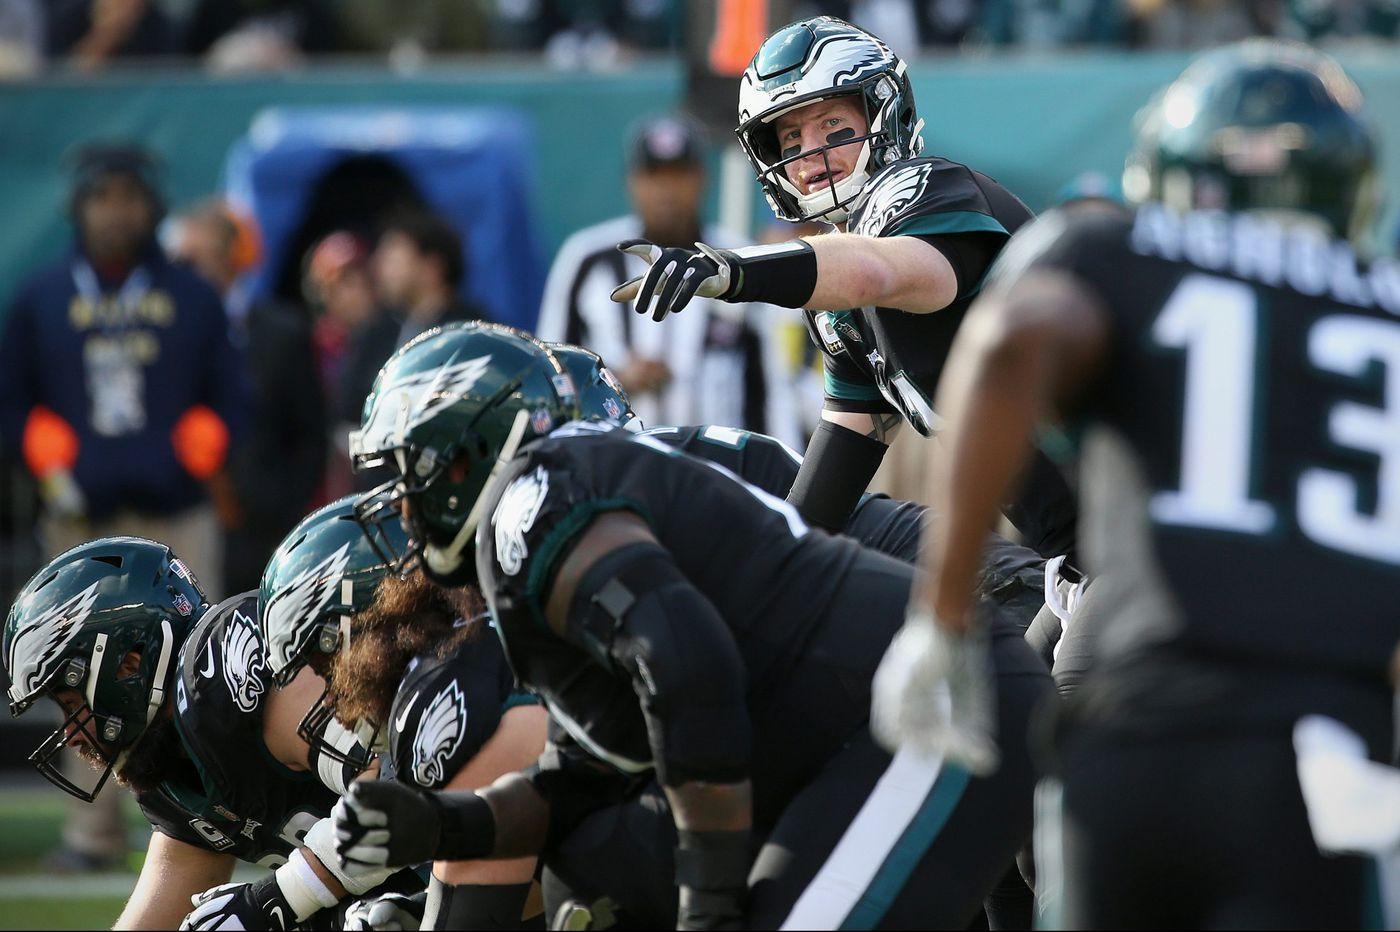 Eagles offense took a step forward against Giants, but it faces a steep climb ahead